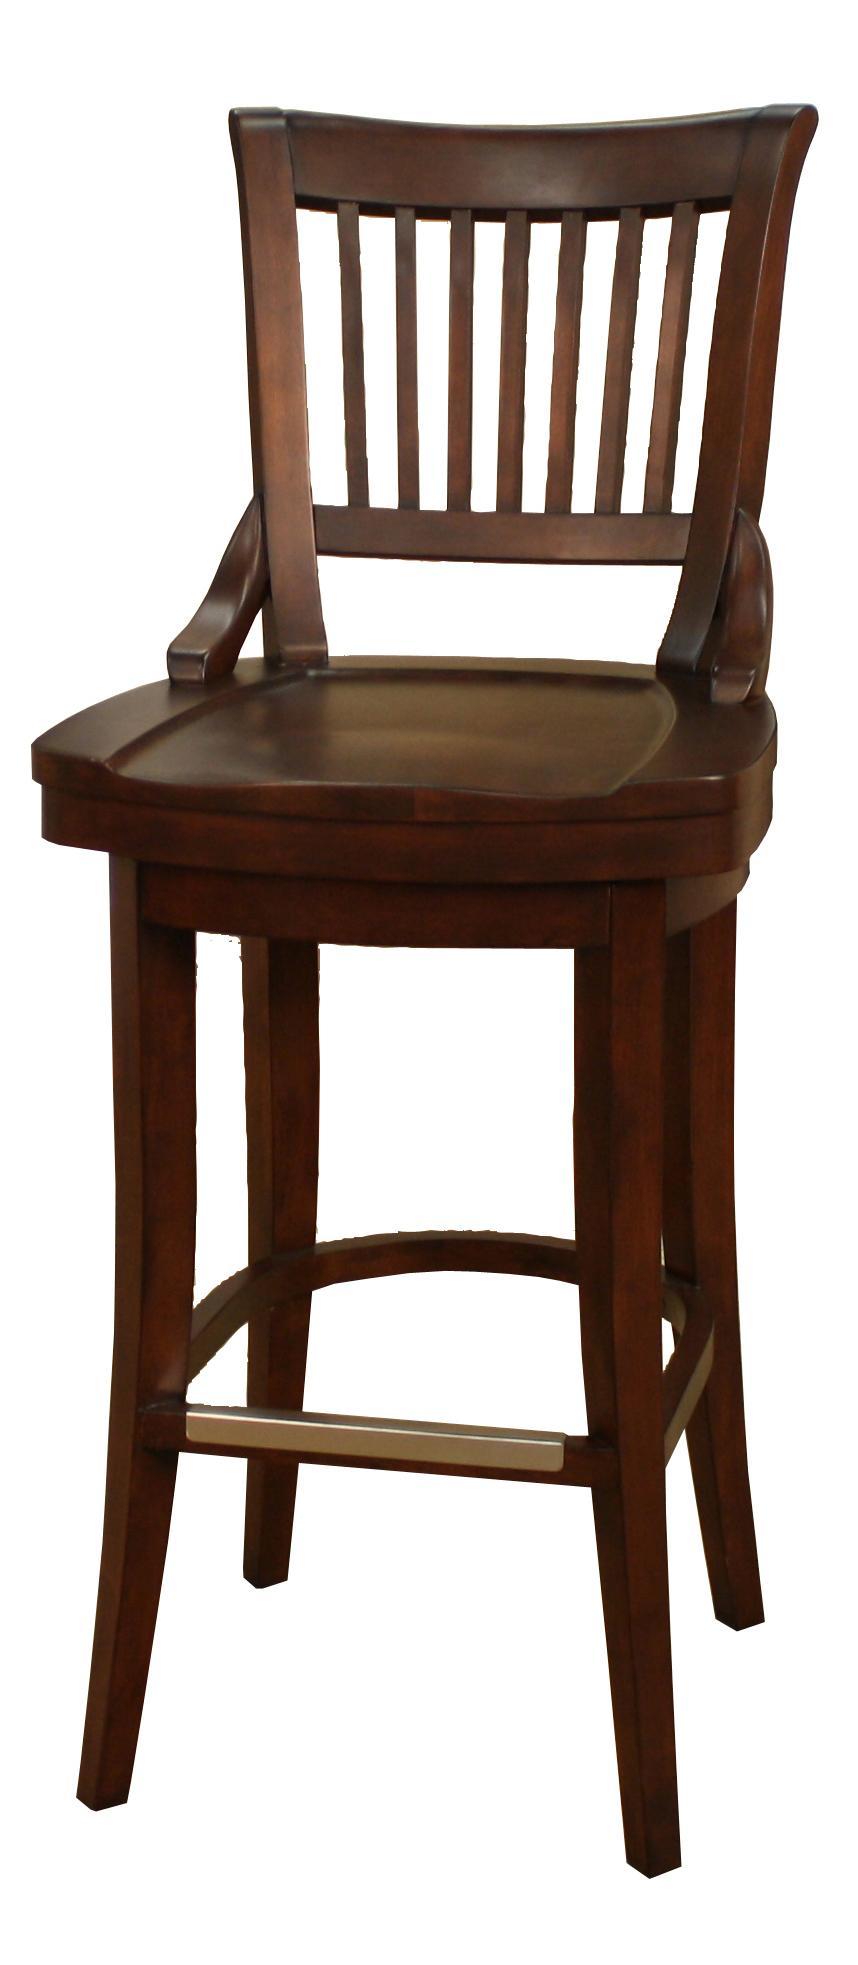 american heritage billiards bar stools 134755sd 34 inch liberty bar stool becker furniture. Black Bedroom Furniture Sets. Home Design Ideas